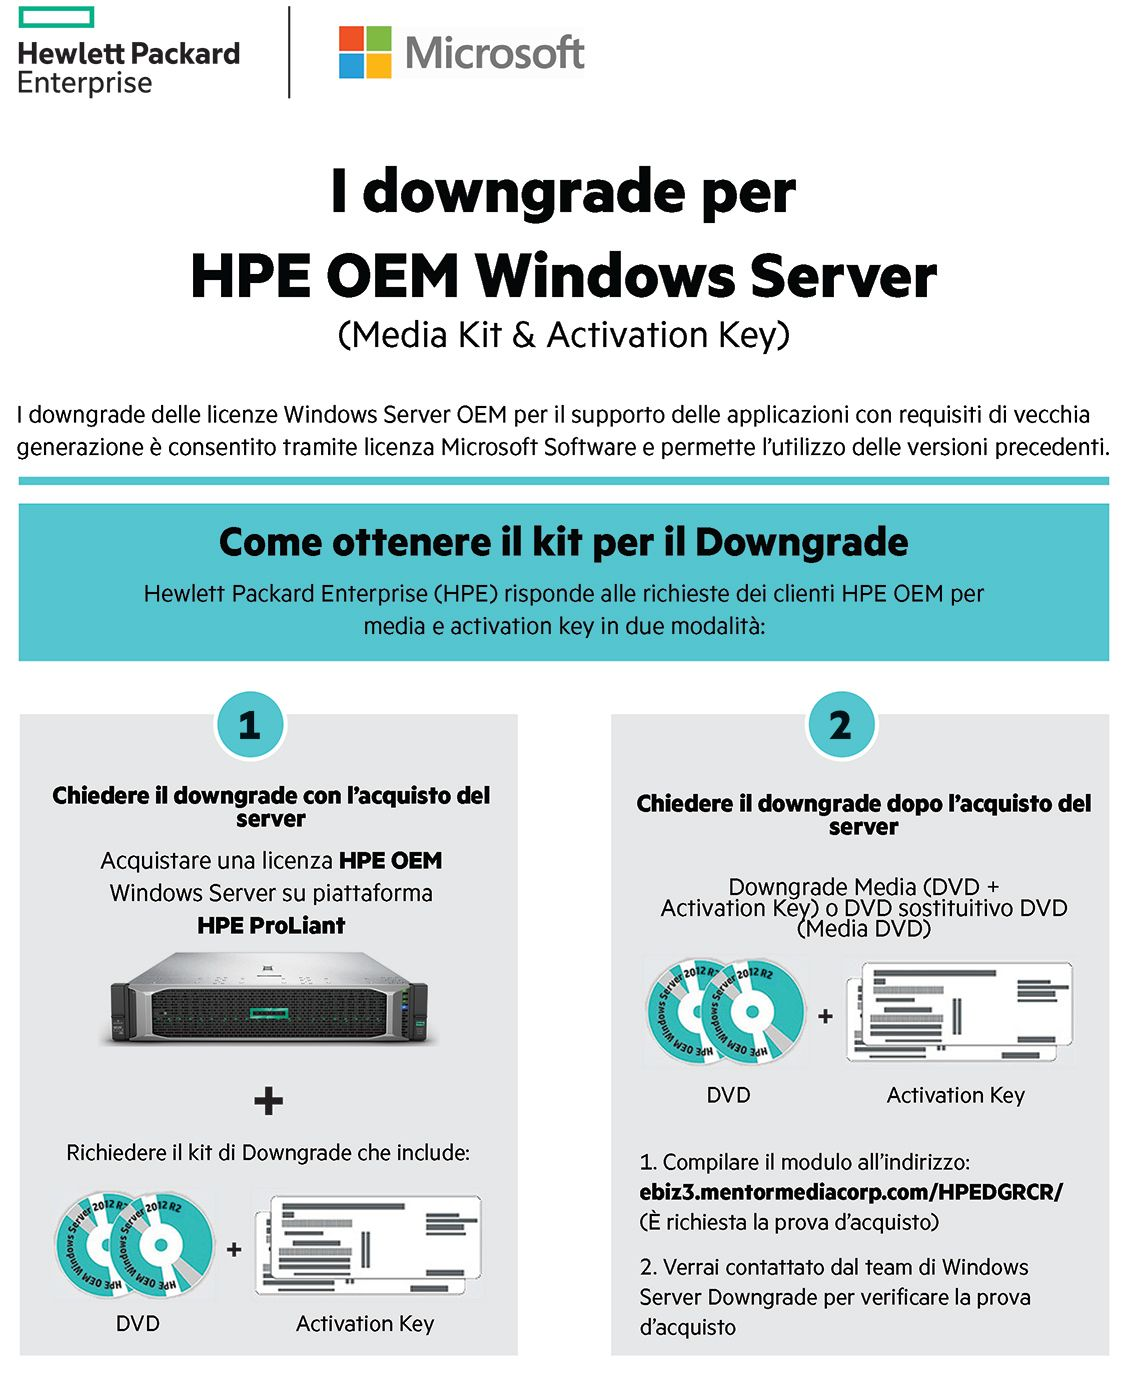 Downgrade infographic (editable).jpg